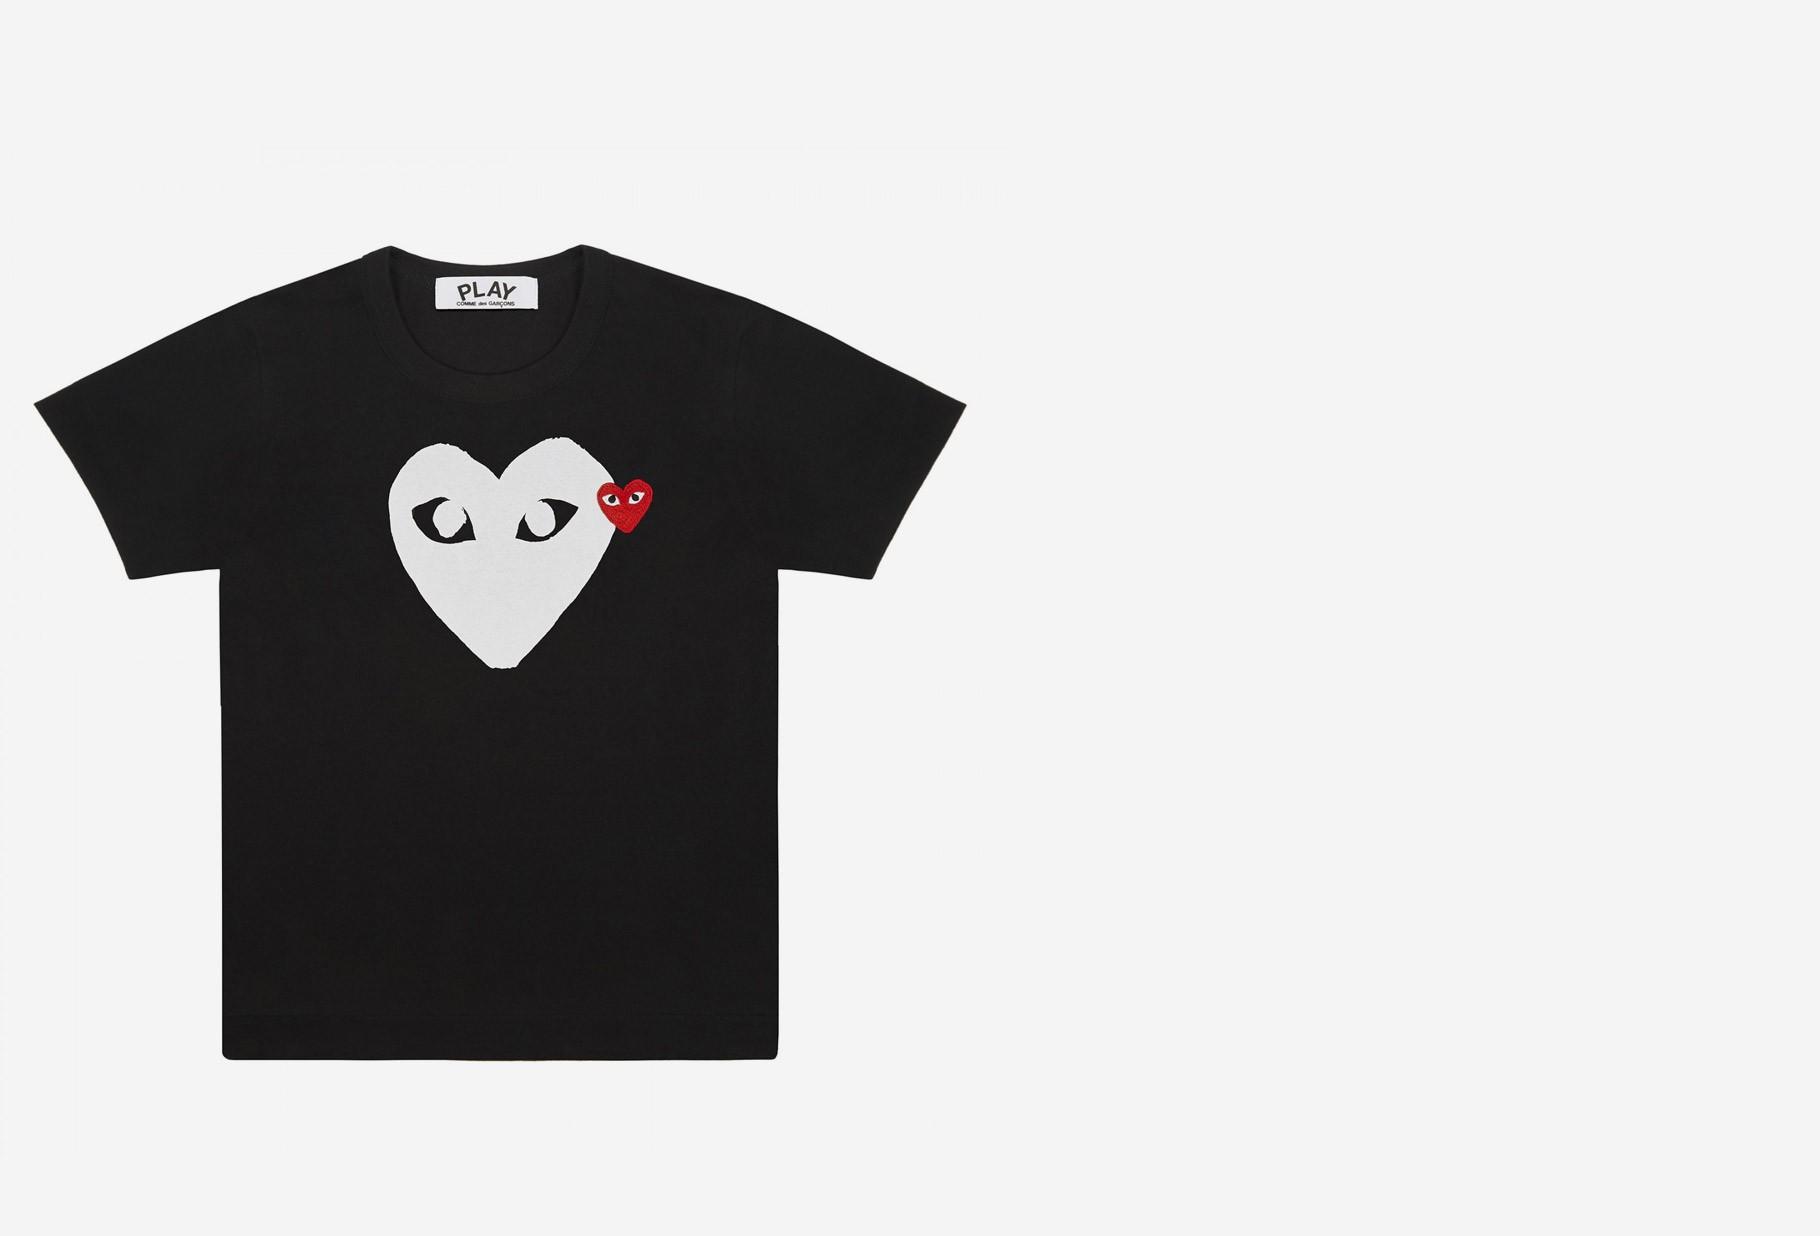 COMME DES GARÇONS PLAY / Red play t-shirt white heart Black